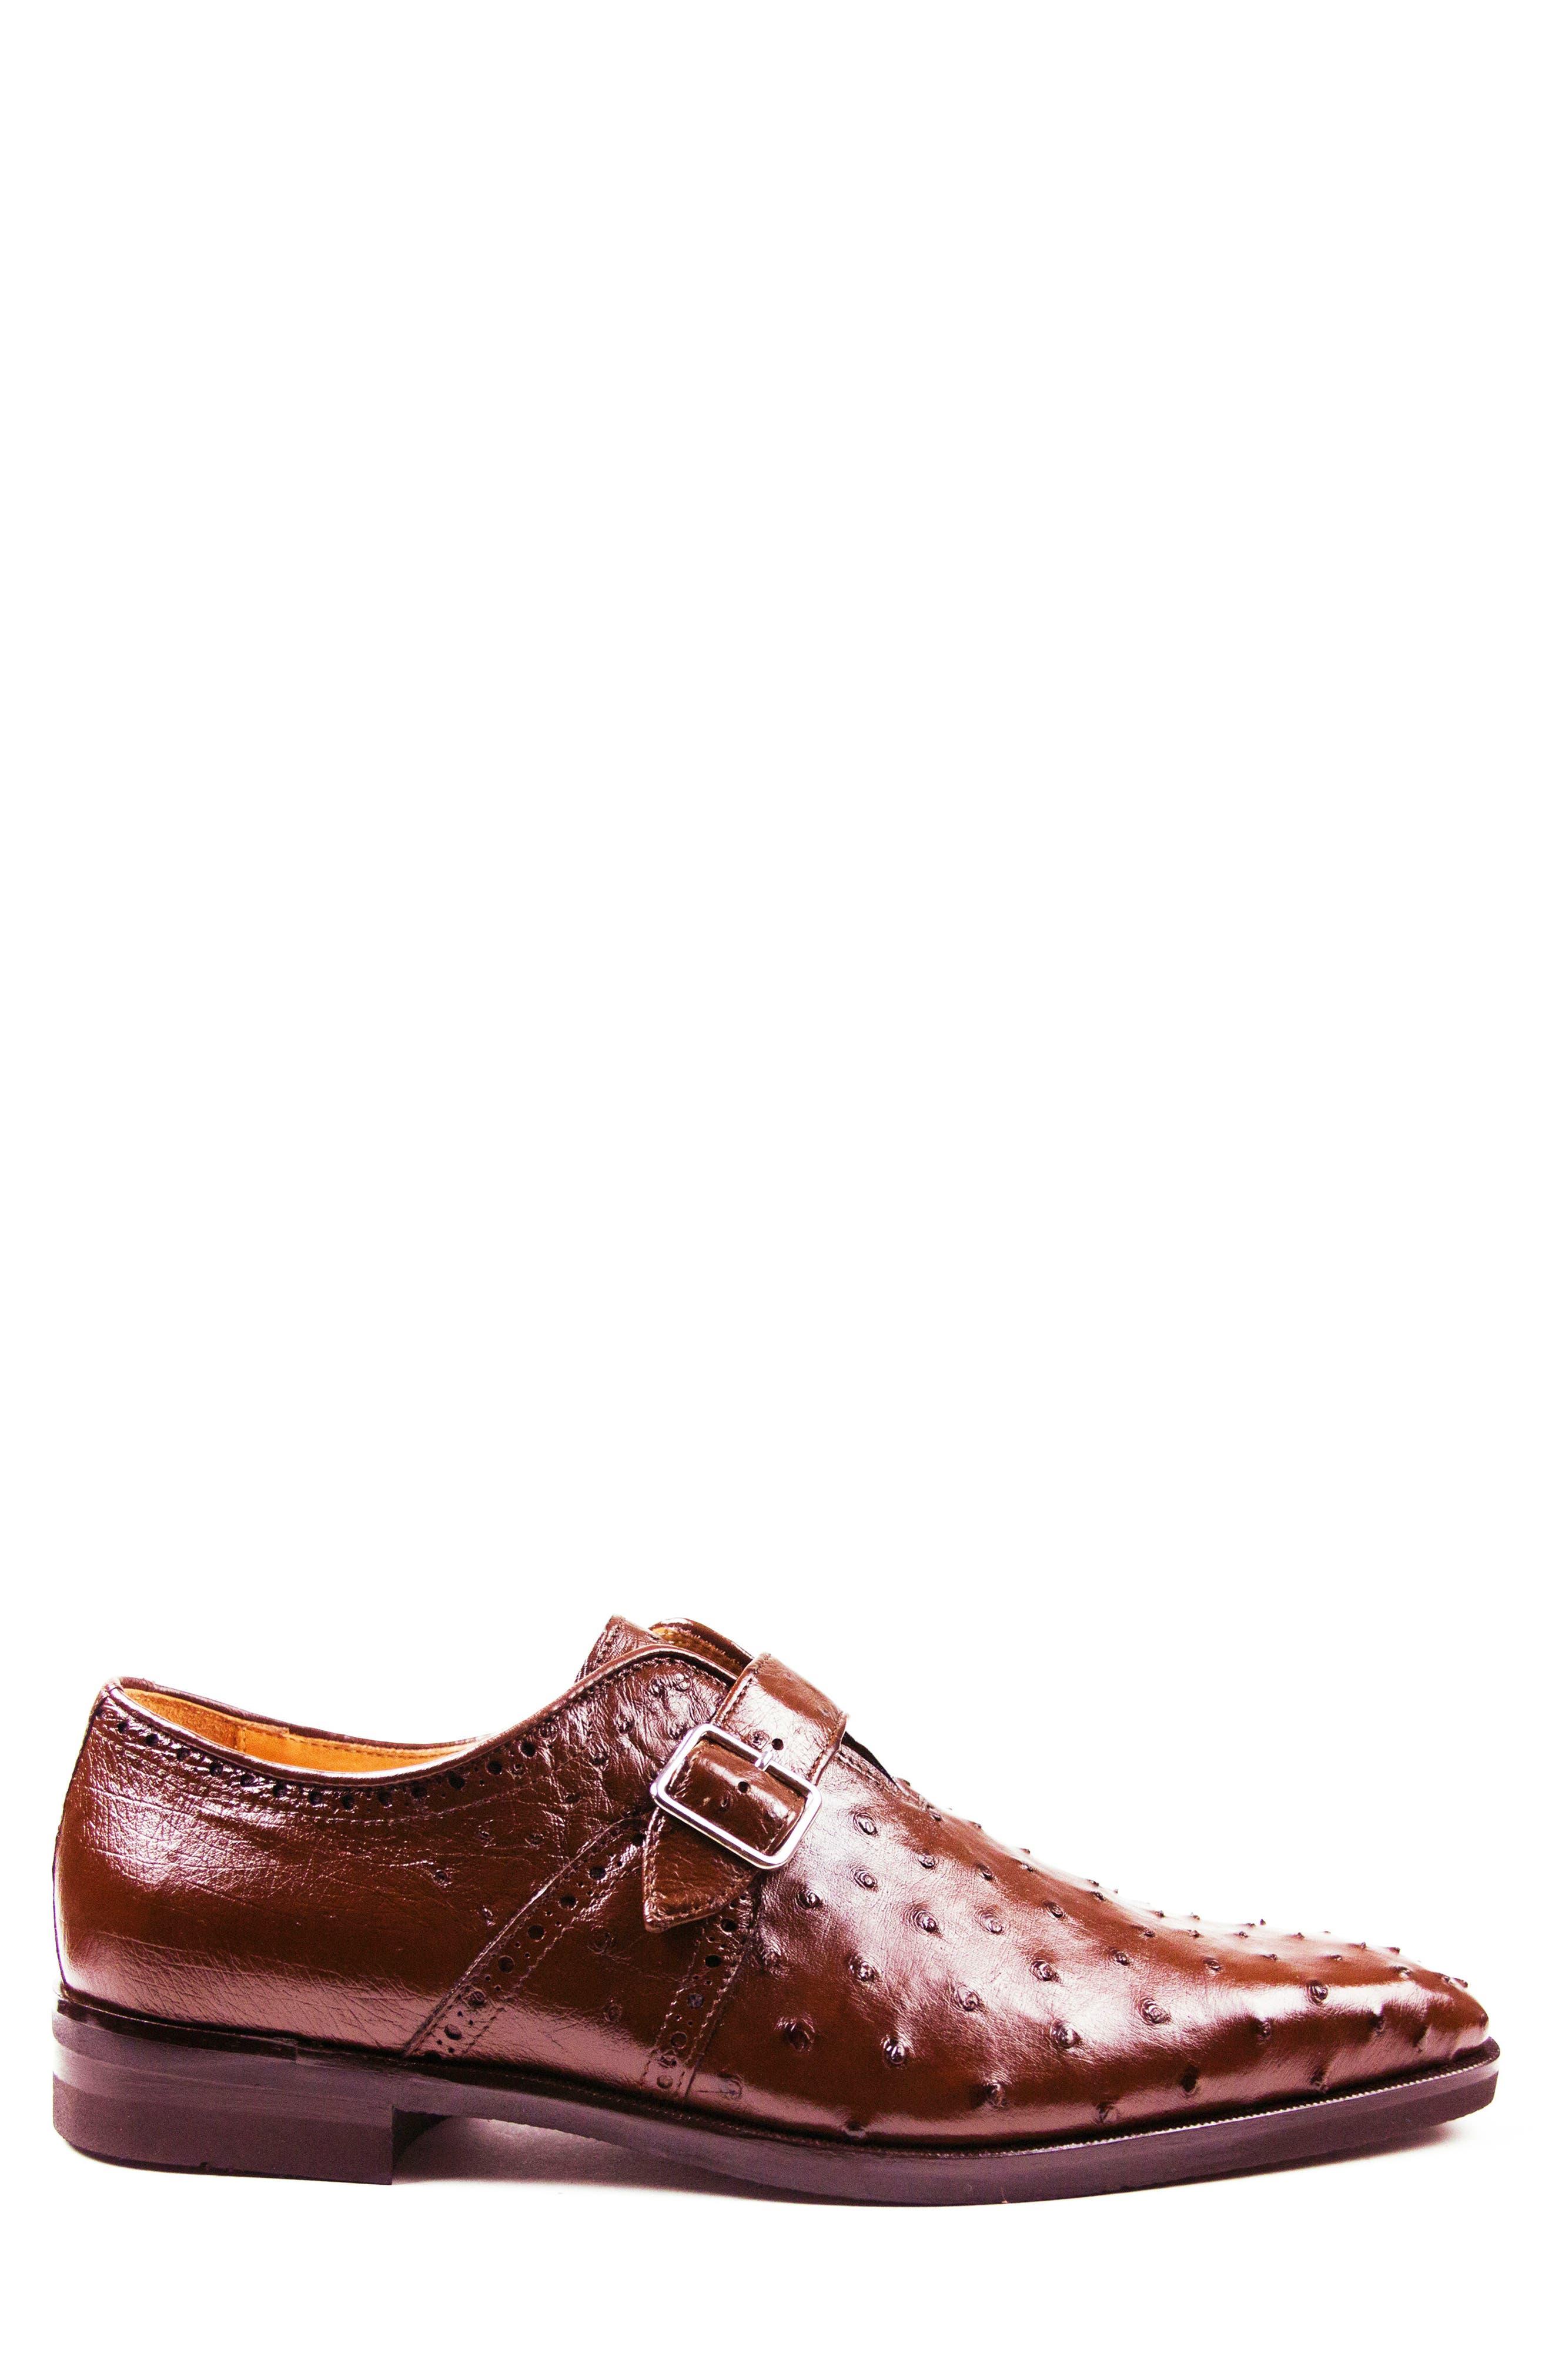 Alternate Image 3  - Zelli Antonio Monk Strap Ostrich Leather Shoe (Men)